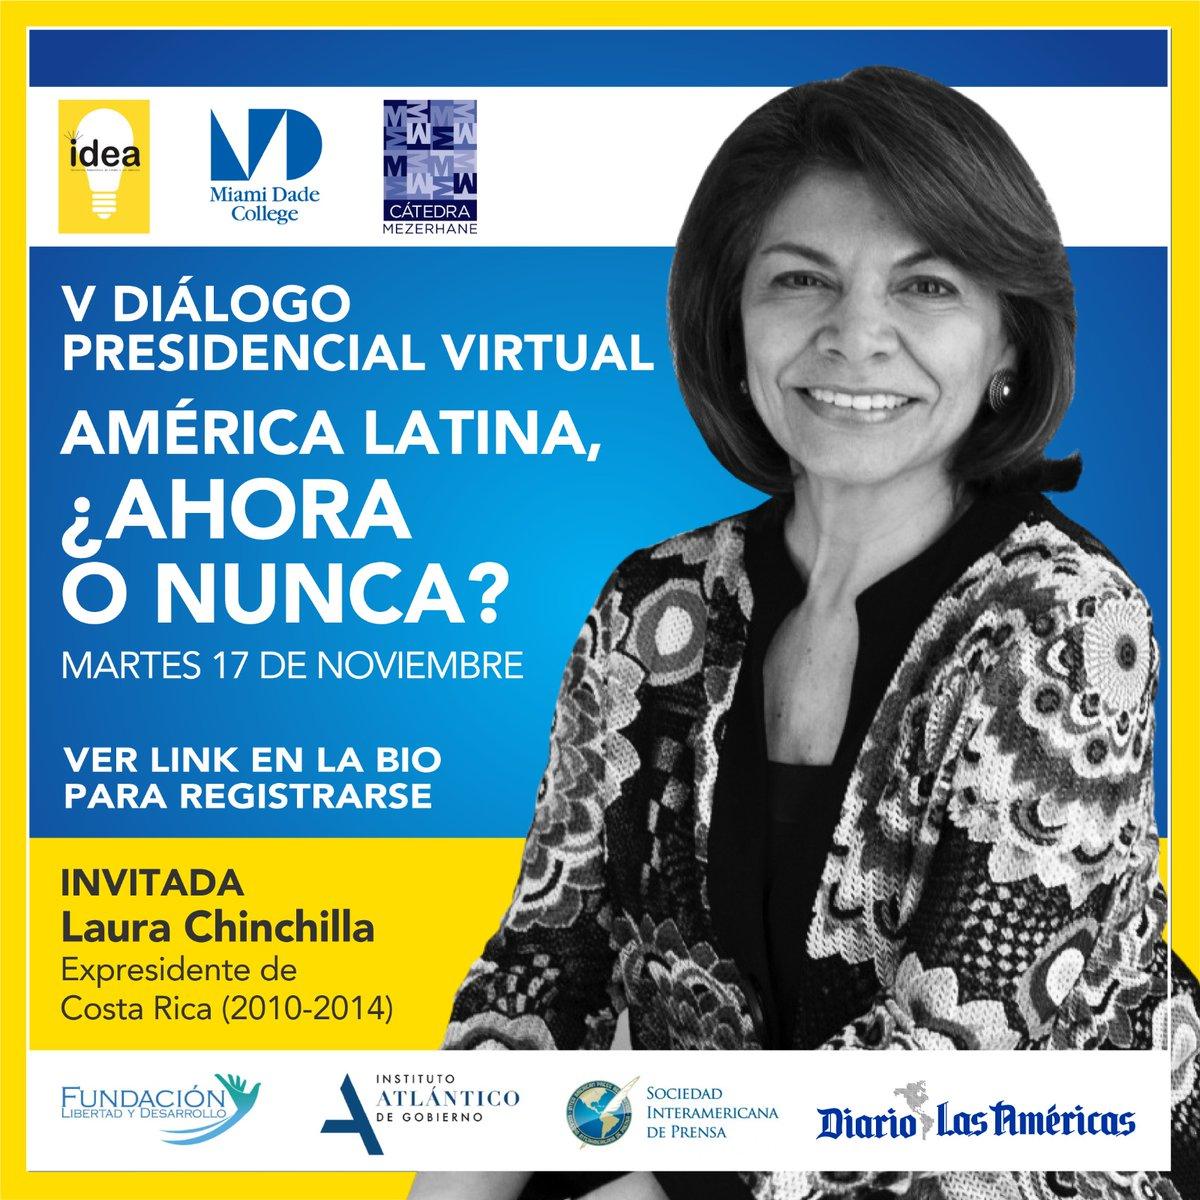 Laura Chinchilla (@Laura_Ch) Expresidente de Costa Rica. diariolasamericas.com/videos/liberta…